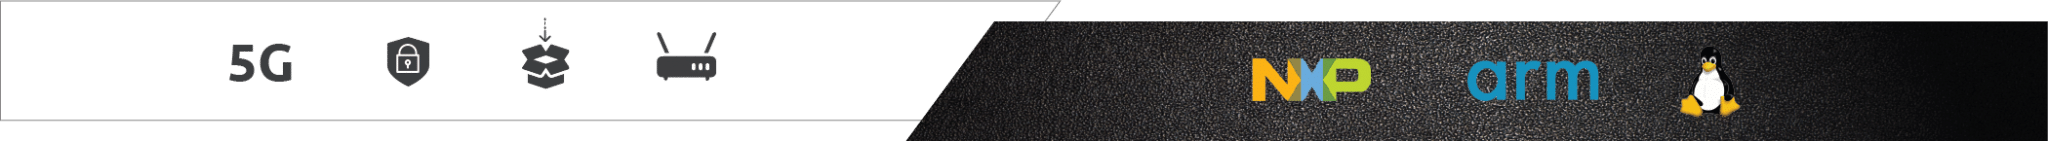 nxp netwoking logo bar